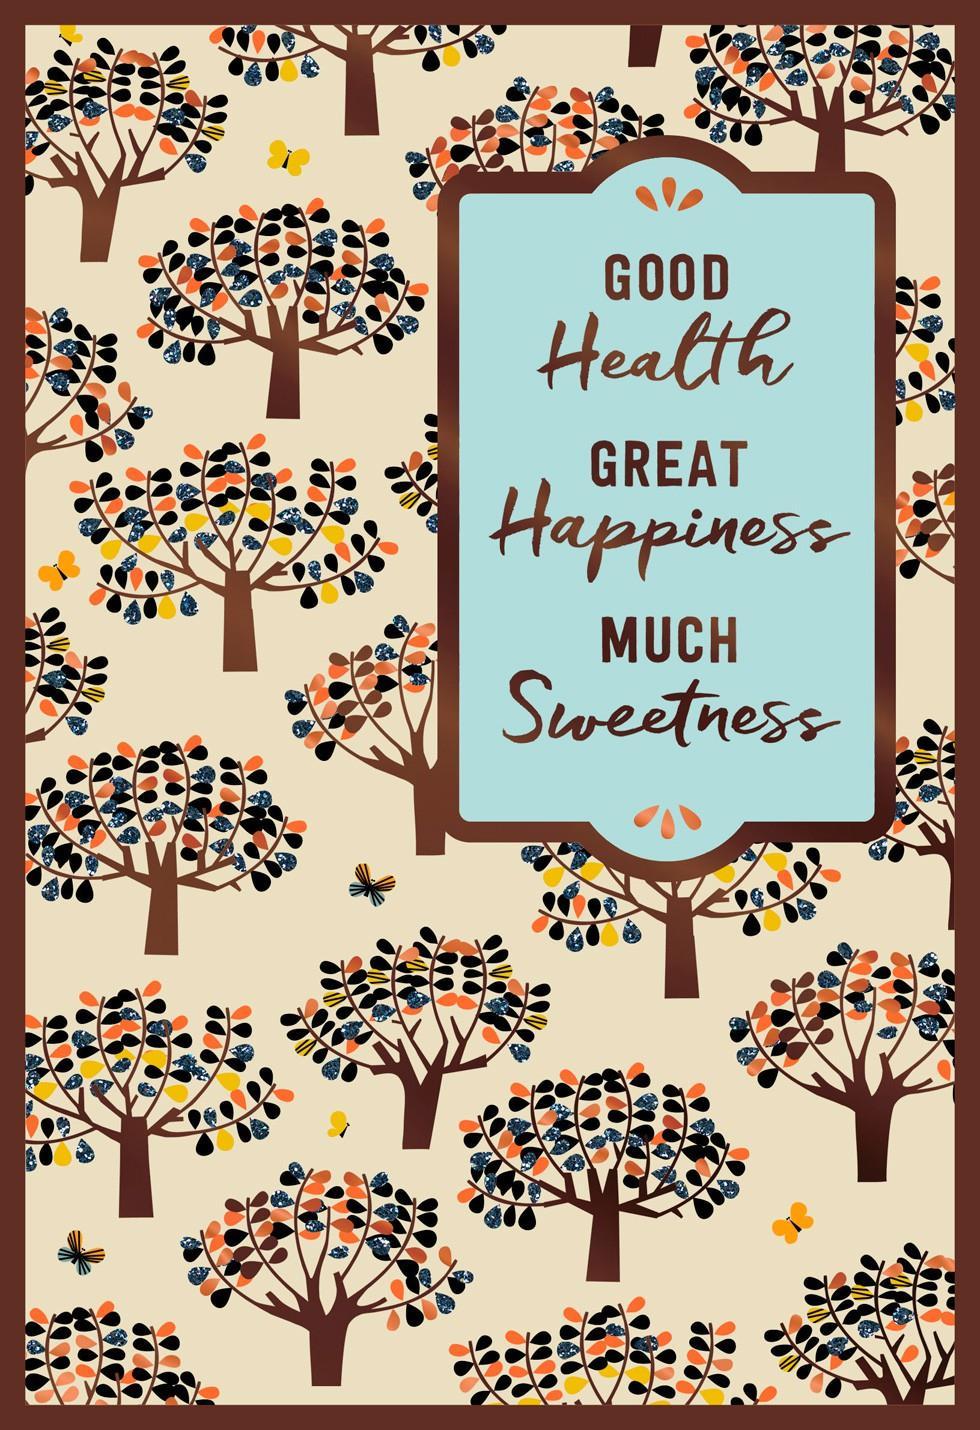 Rosh hashanah jewish new year hallmark health happiness sweetness rosh hashanah card kristyandbryce Choice Image